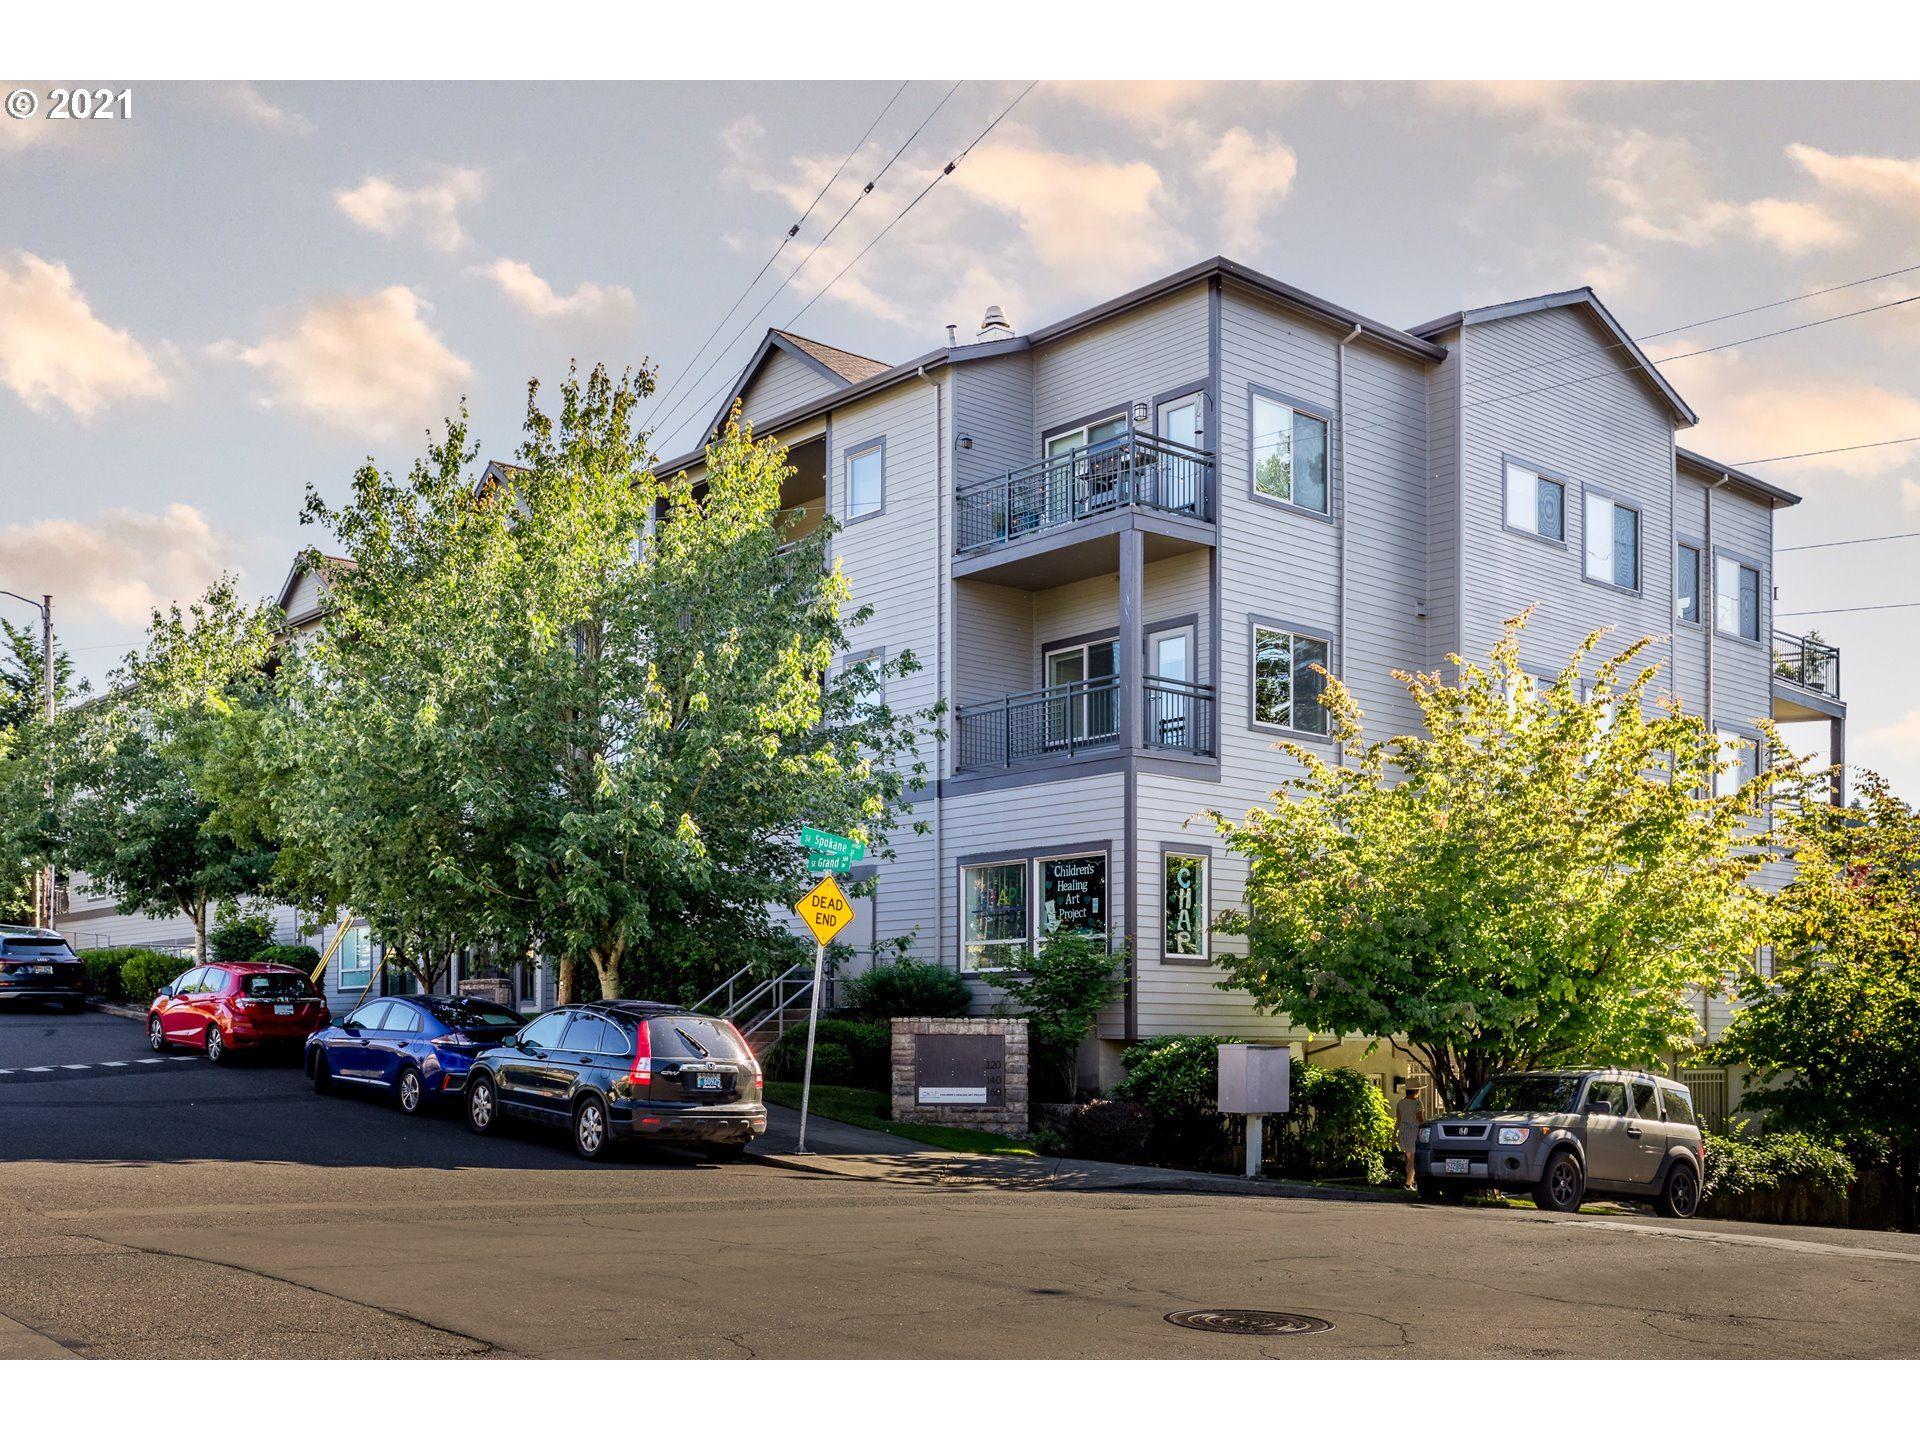 8065 SE GRAND AVE, Portland, OR 97202 - MLS#: 21398021